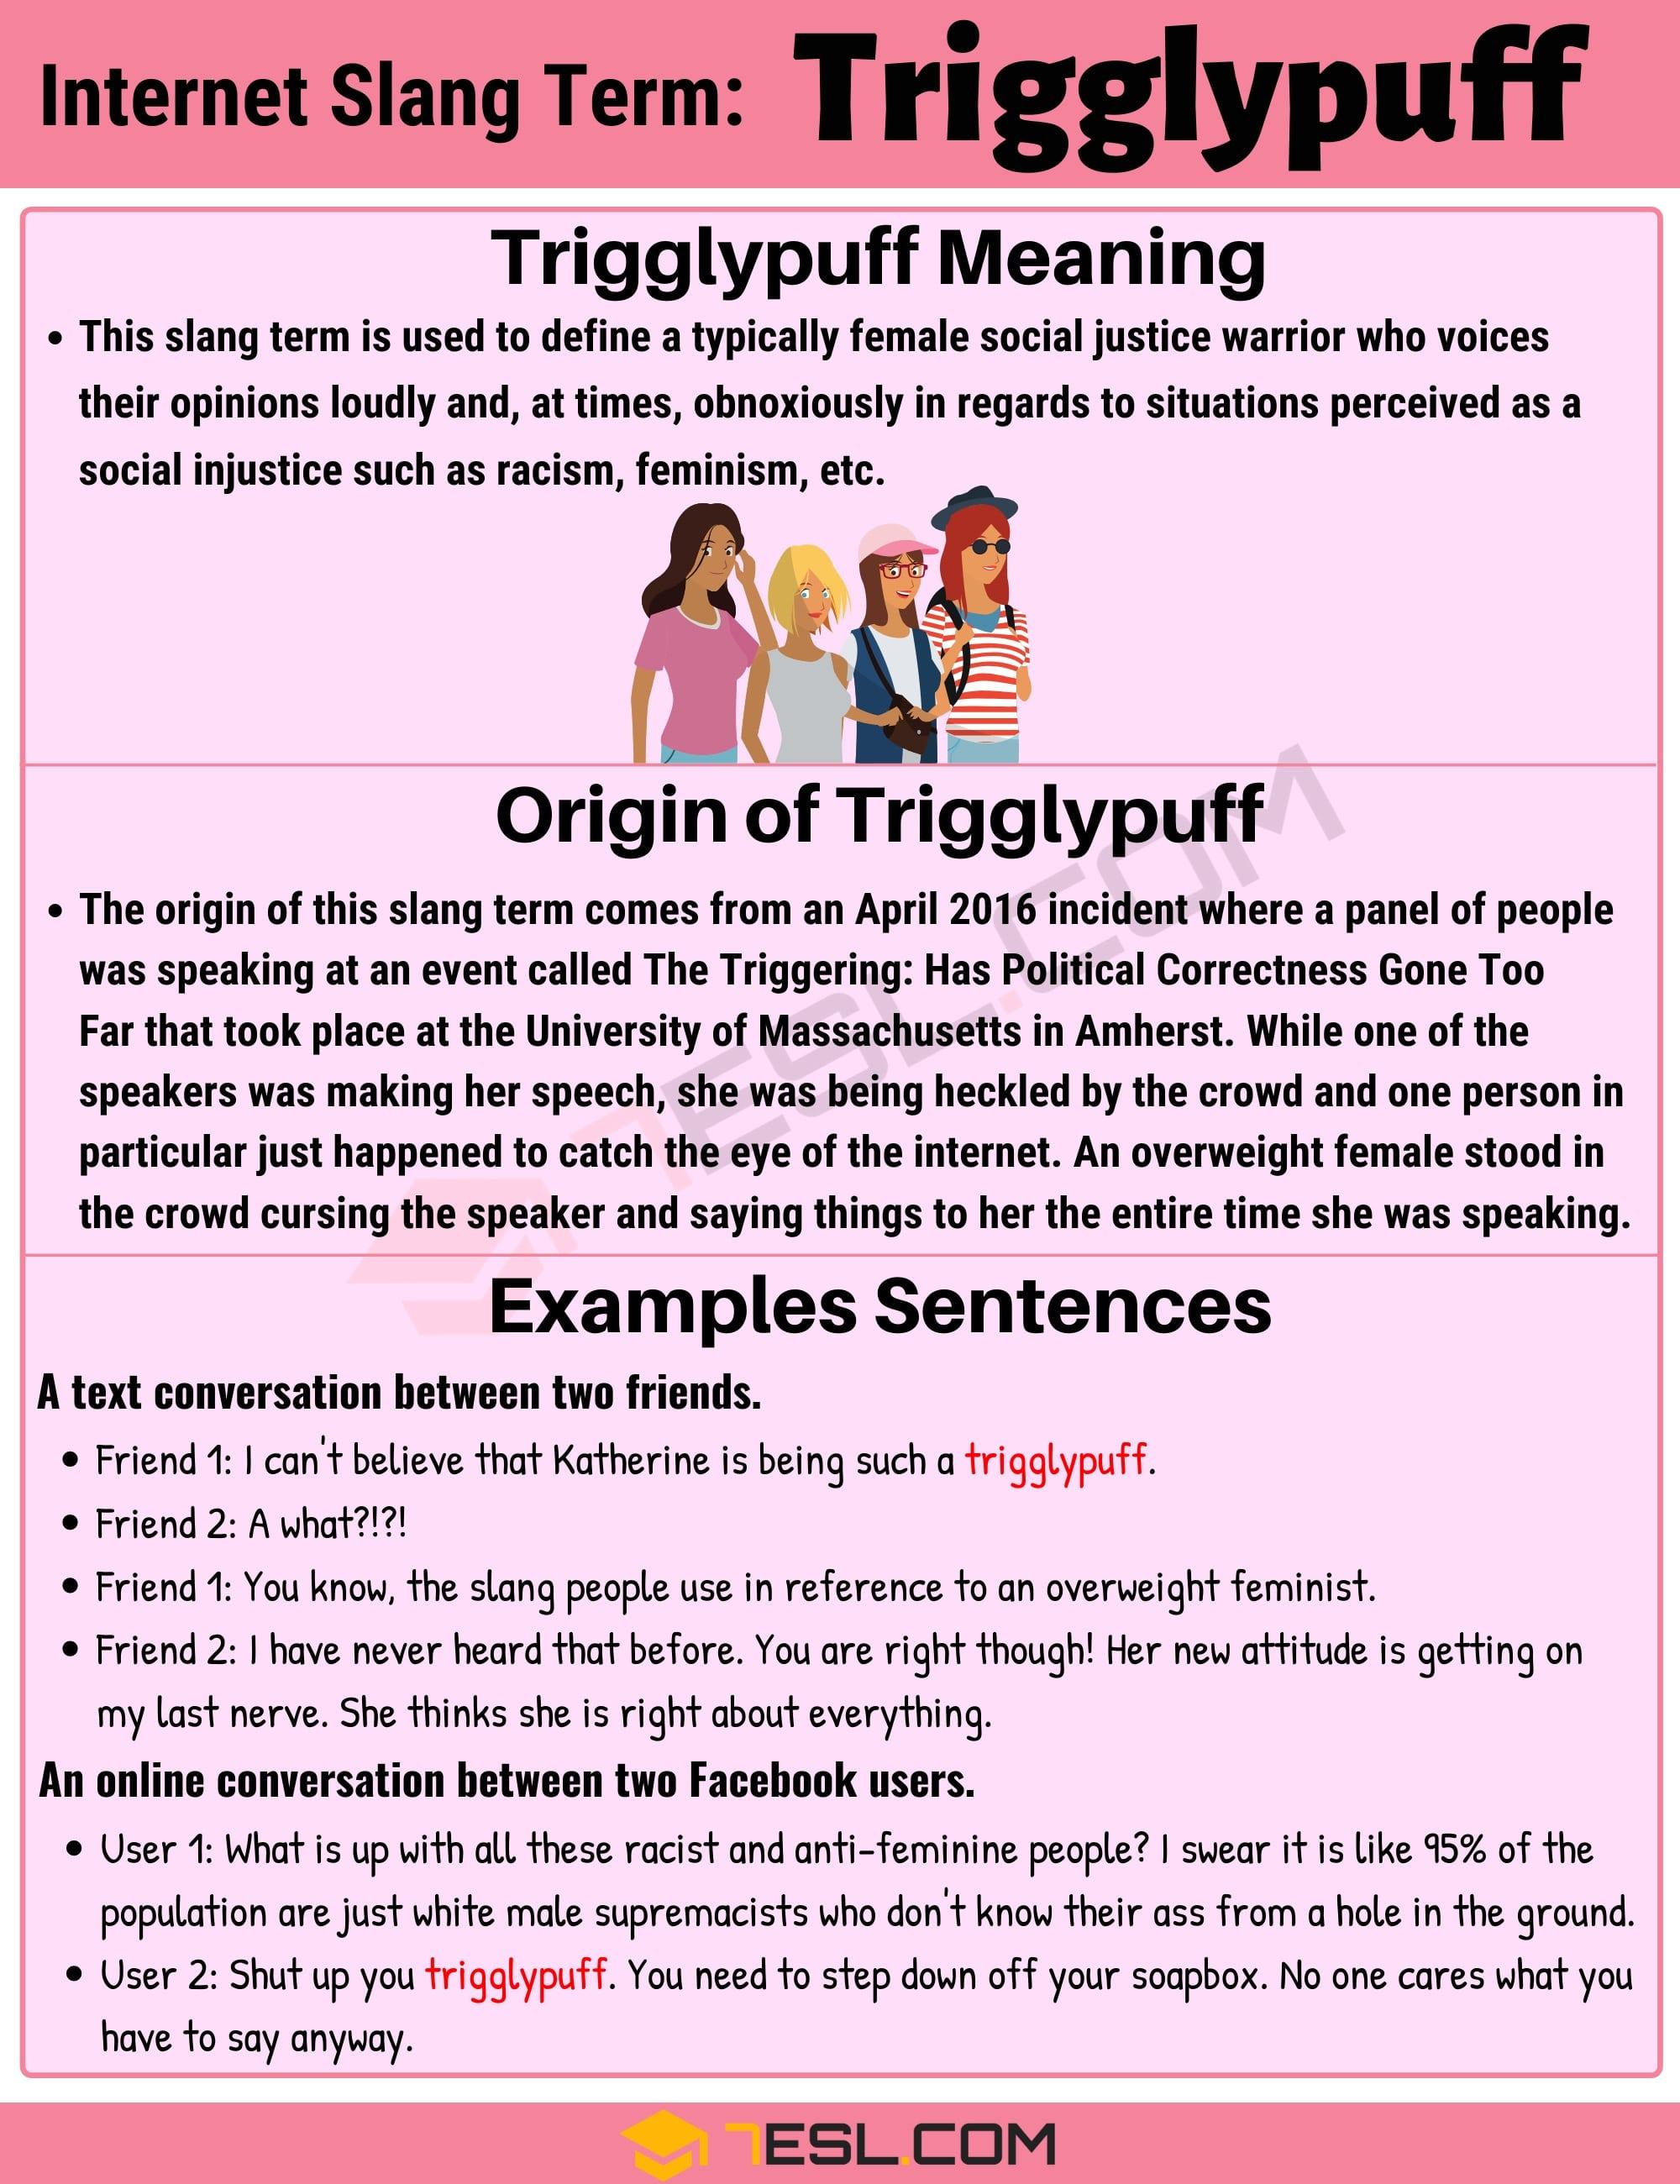 Trigglypuff